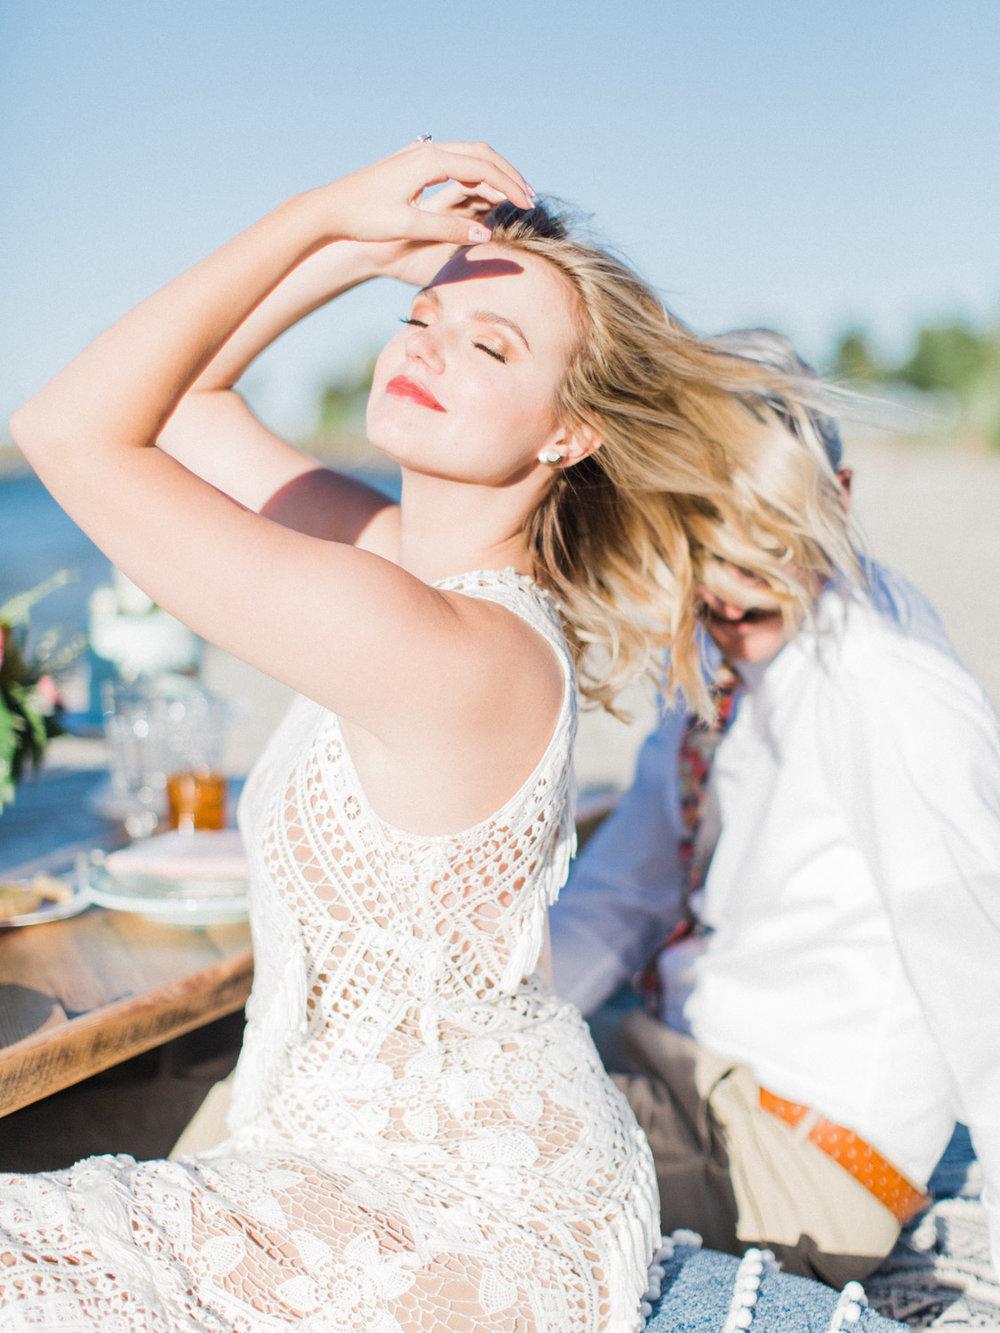 destination-wedding-photographer-adventurous-original-tropical-wedding-inspiration-282.jpg